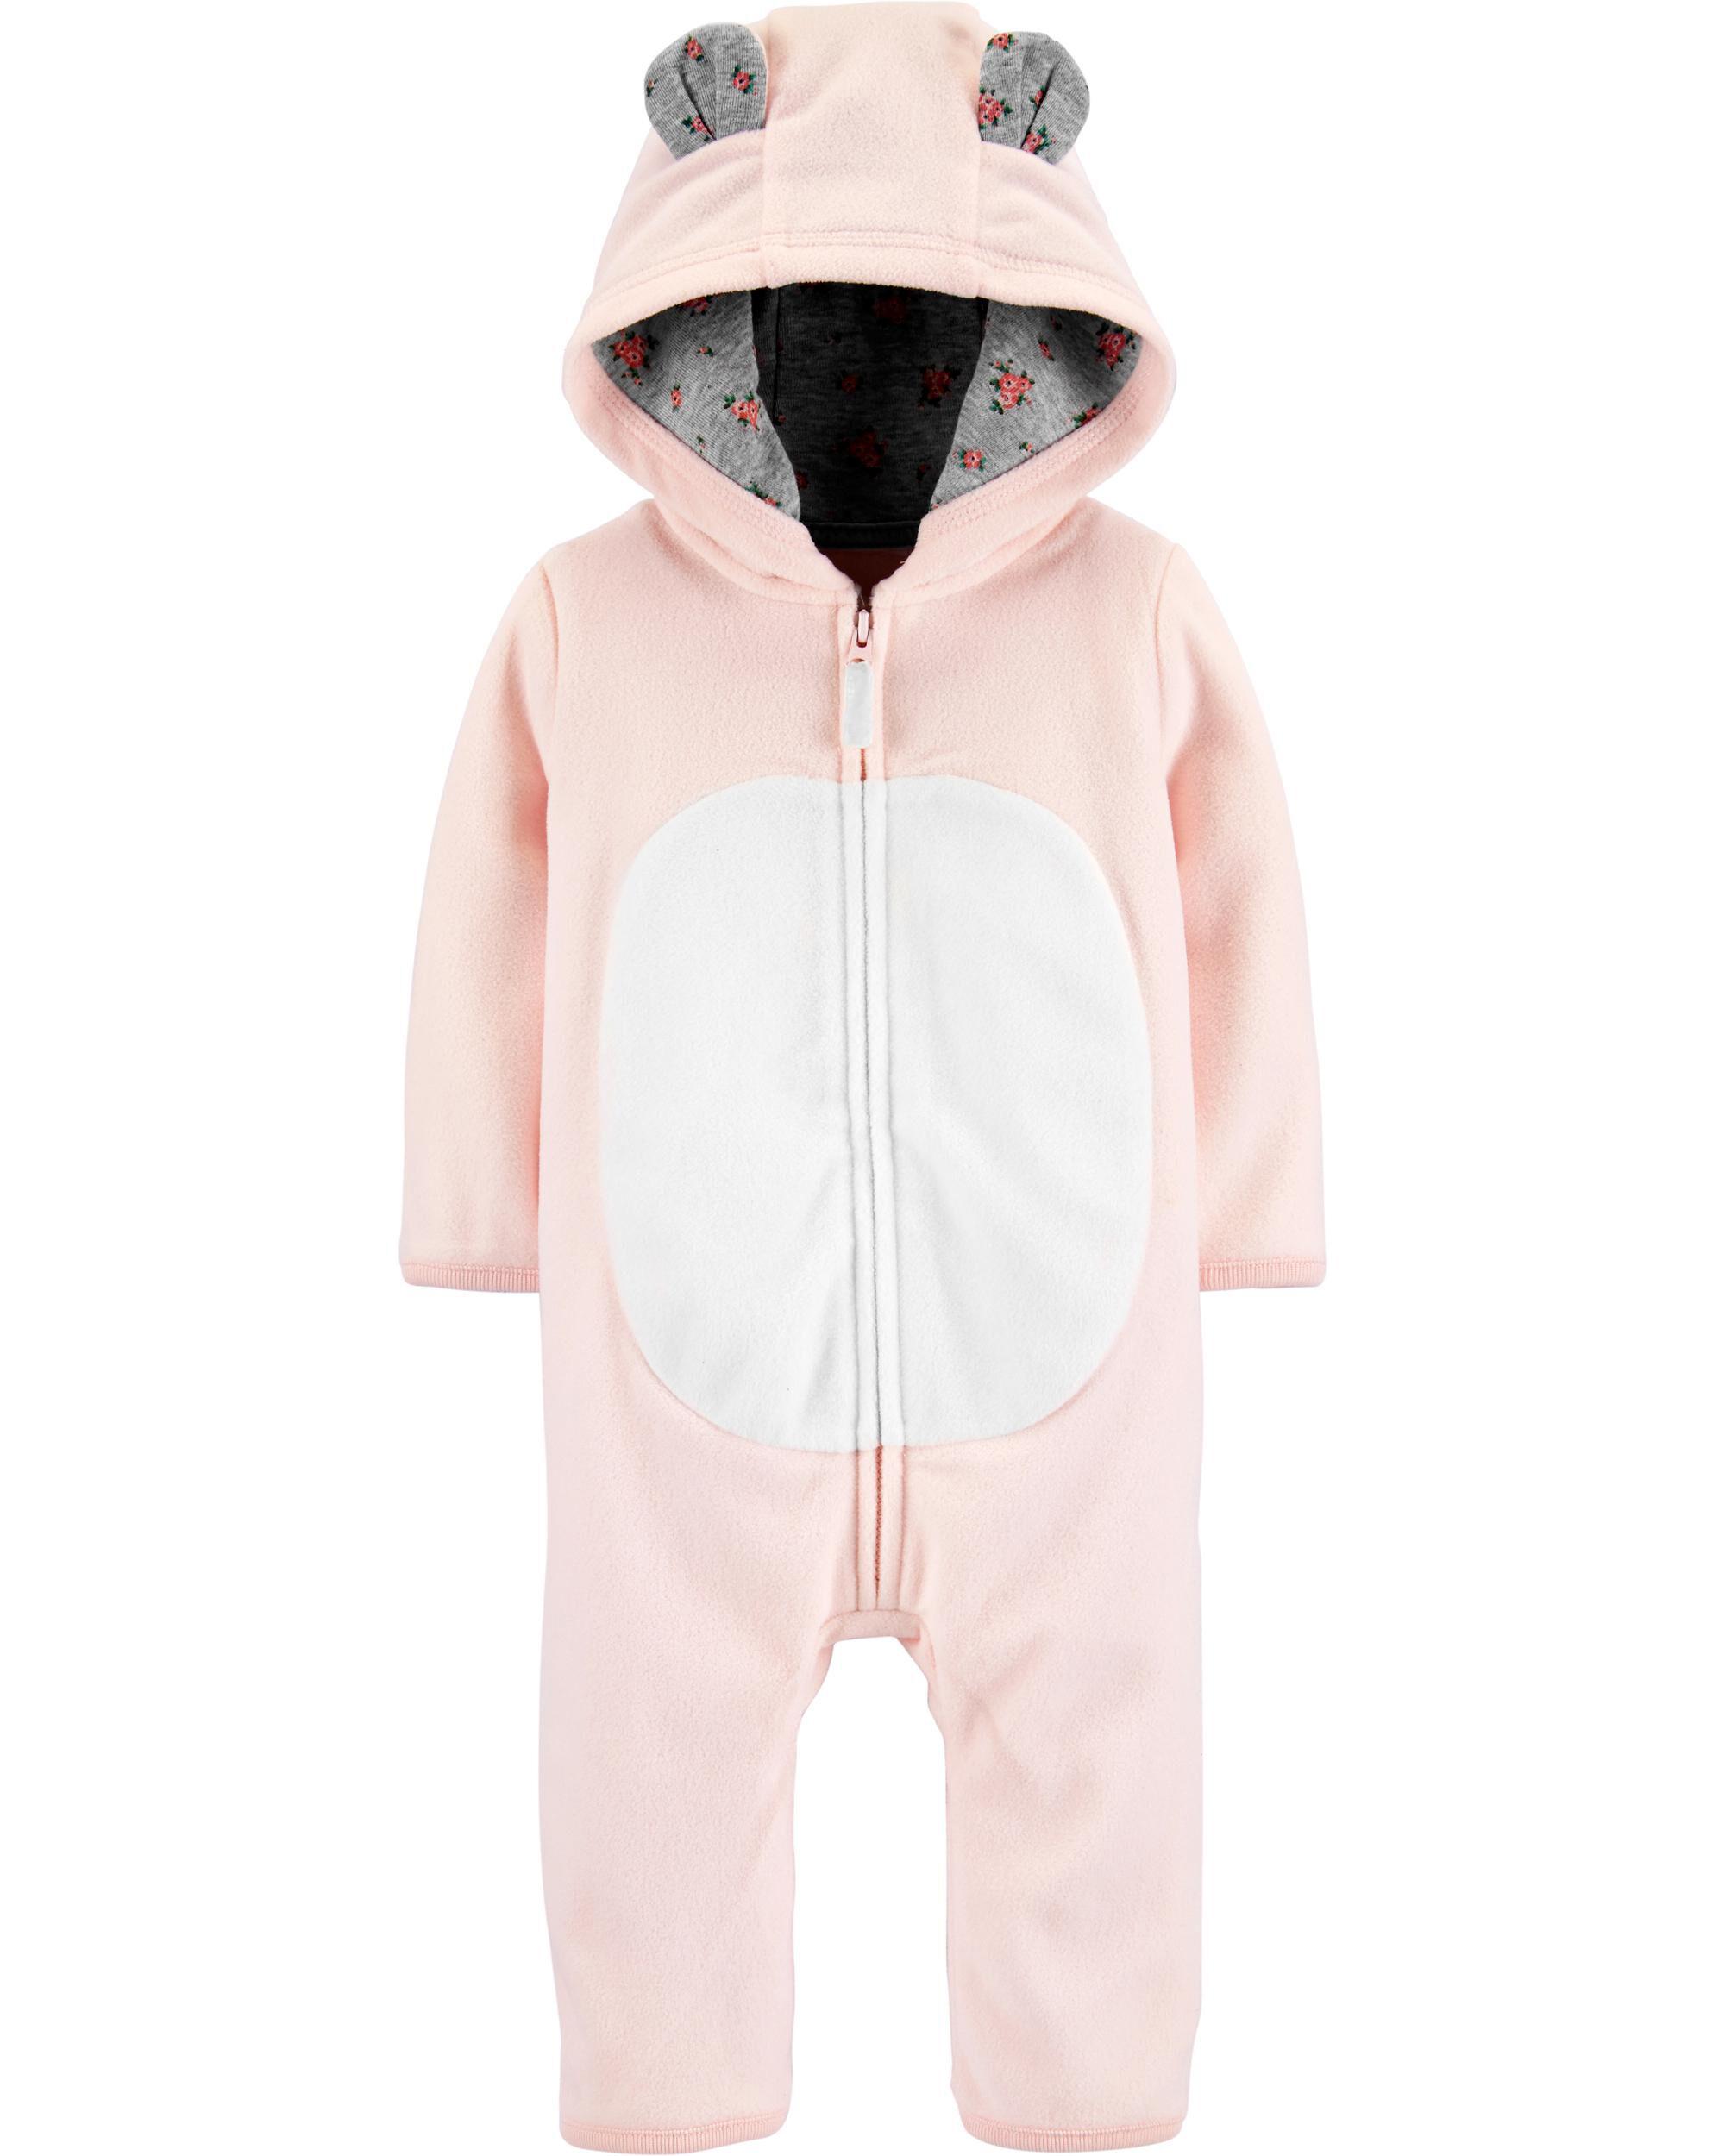 *CLEARANCE* Hooded Bear Fleece Jumpsuit